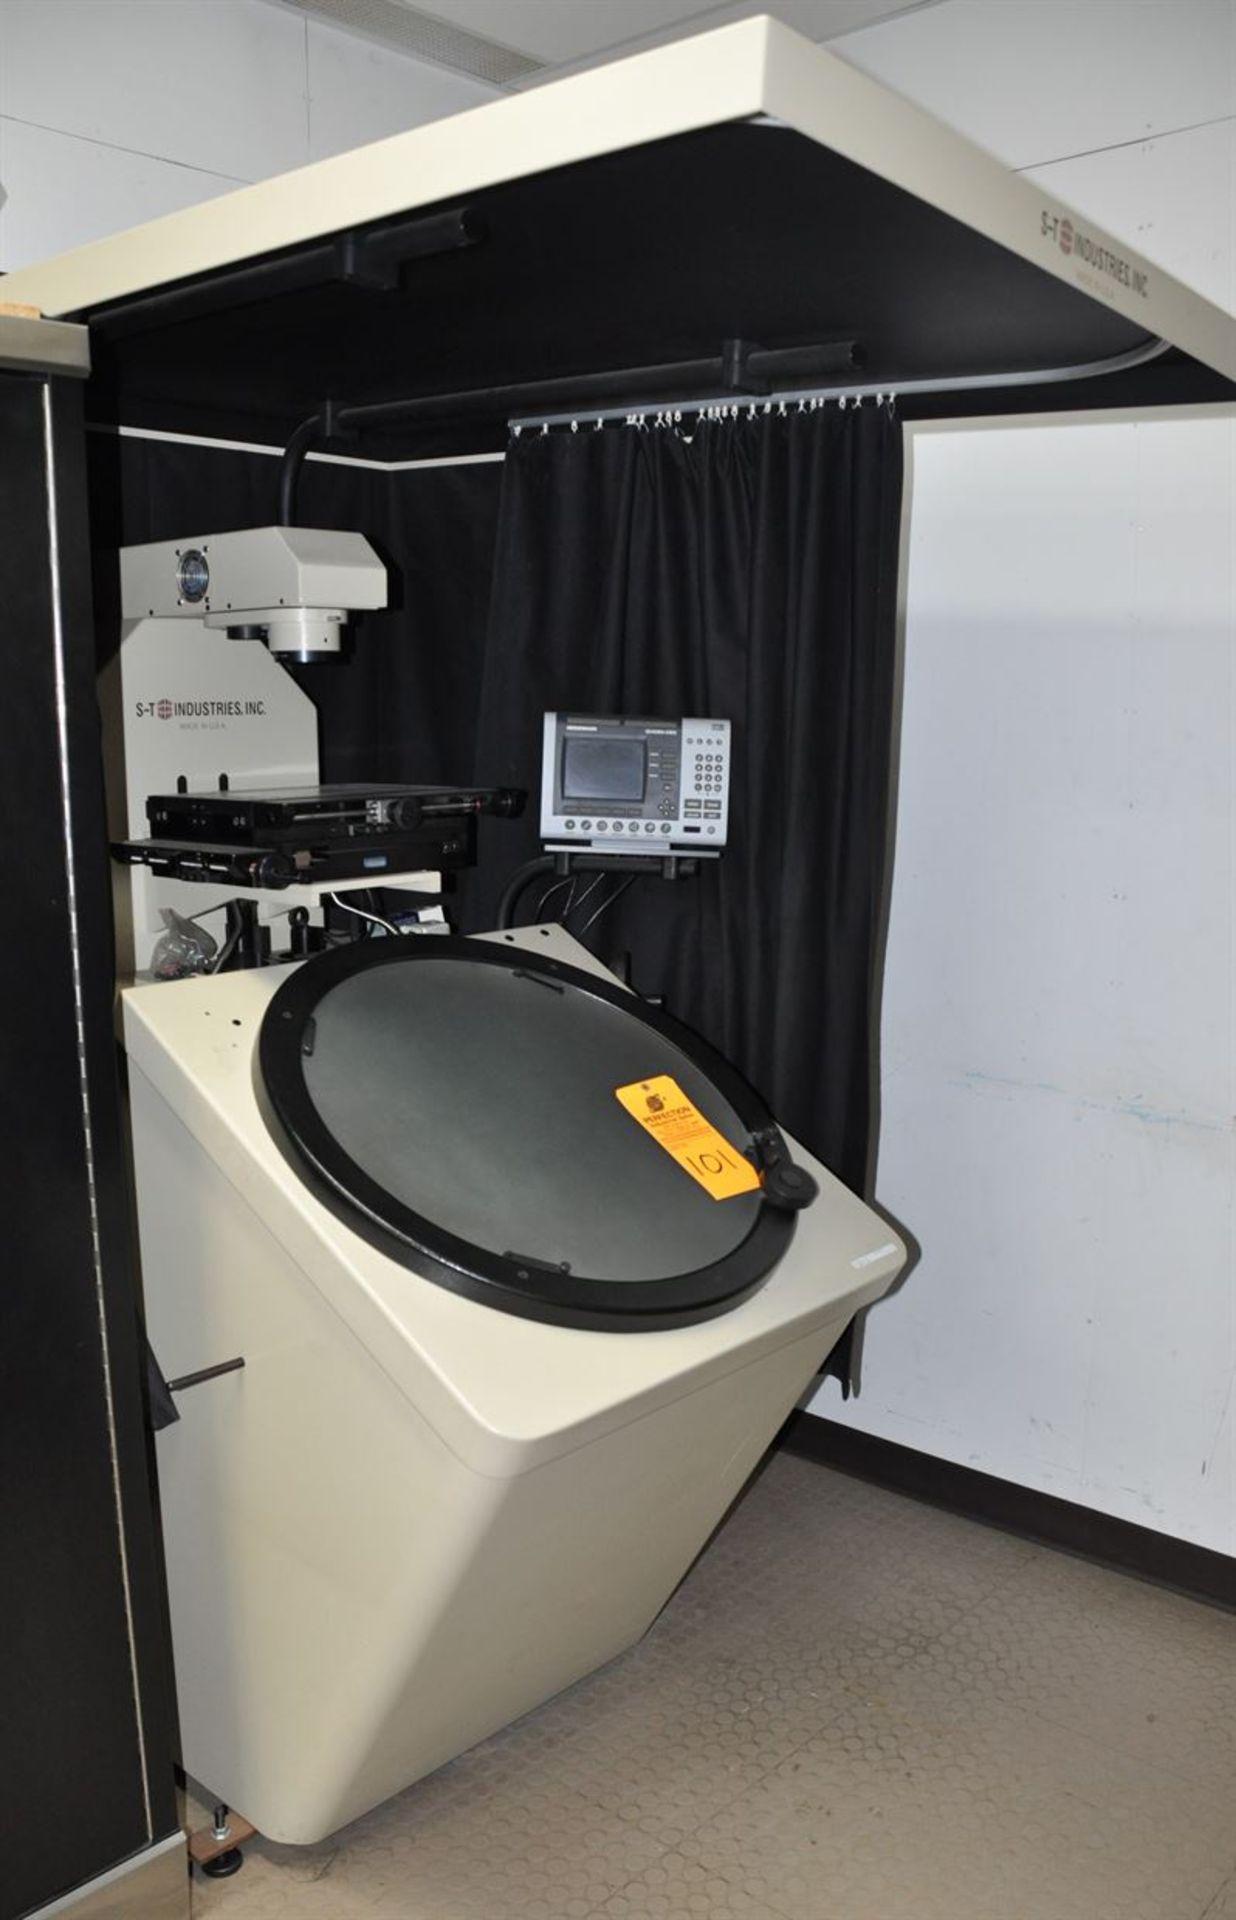 "2012 SCHERR TUMICO 20-2400 24"" Optical Comparator w/ 20x, 50x, 100x magnification, s/n K123201, w/"